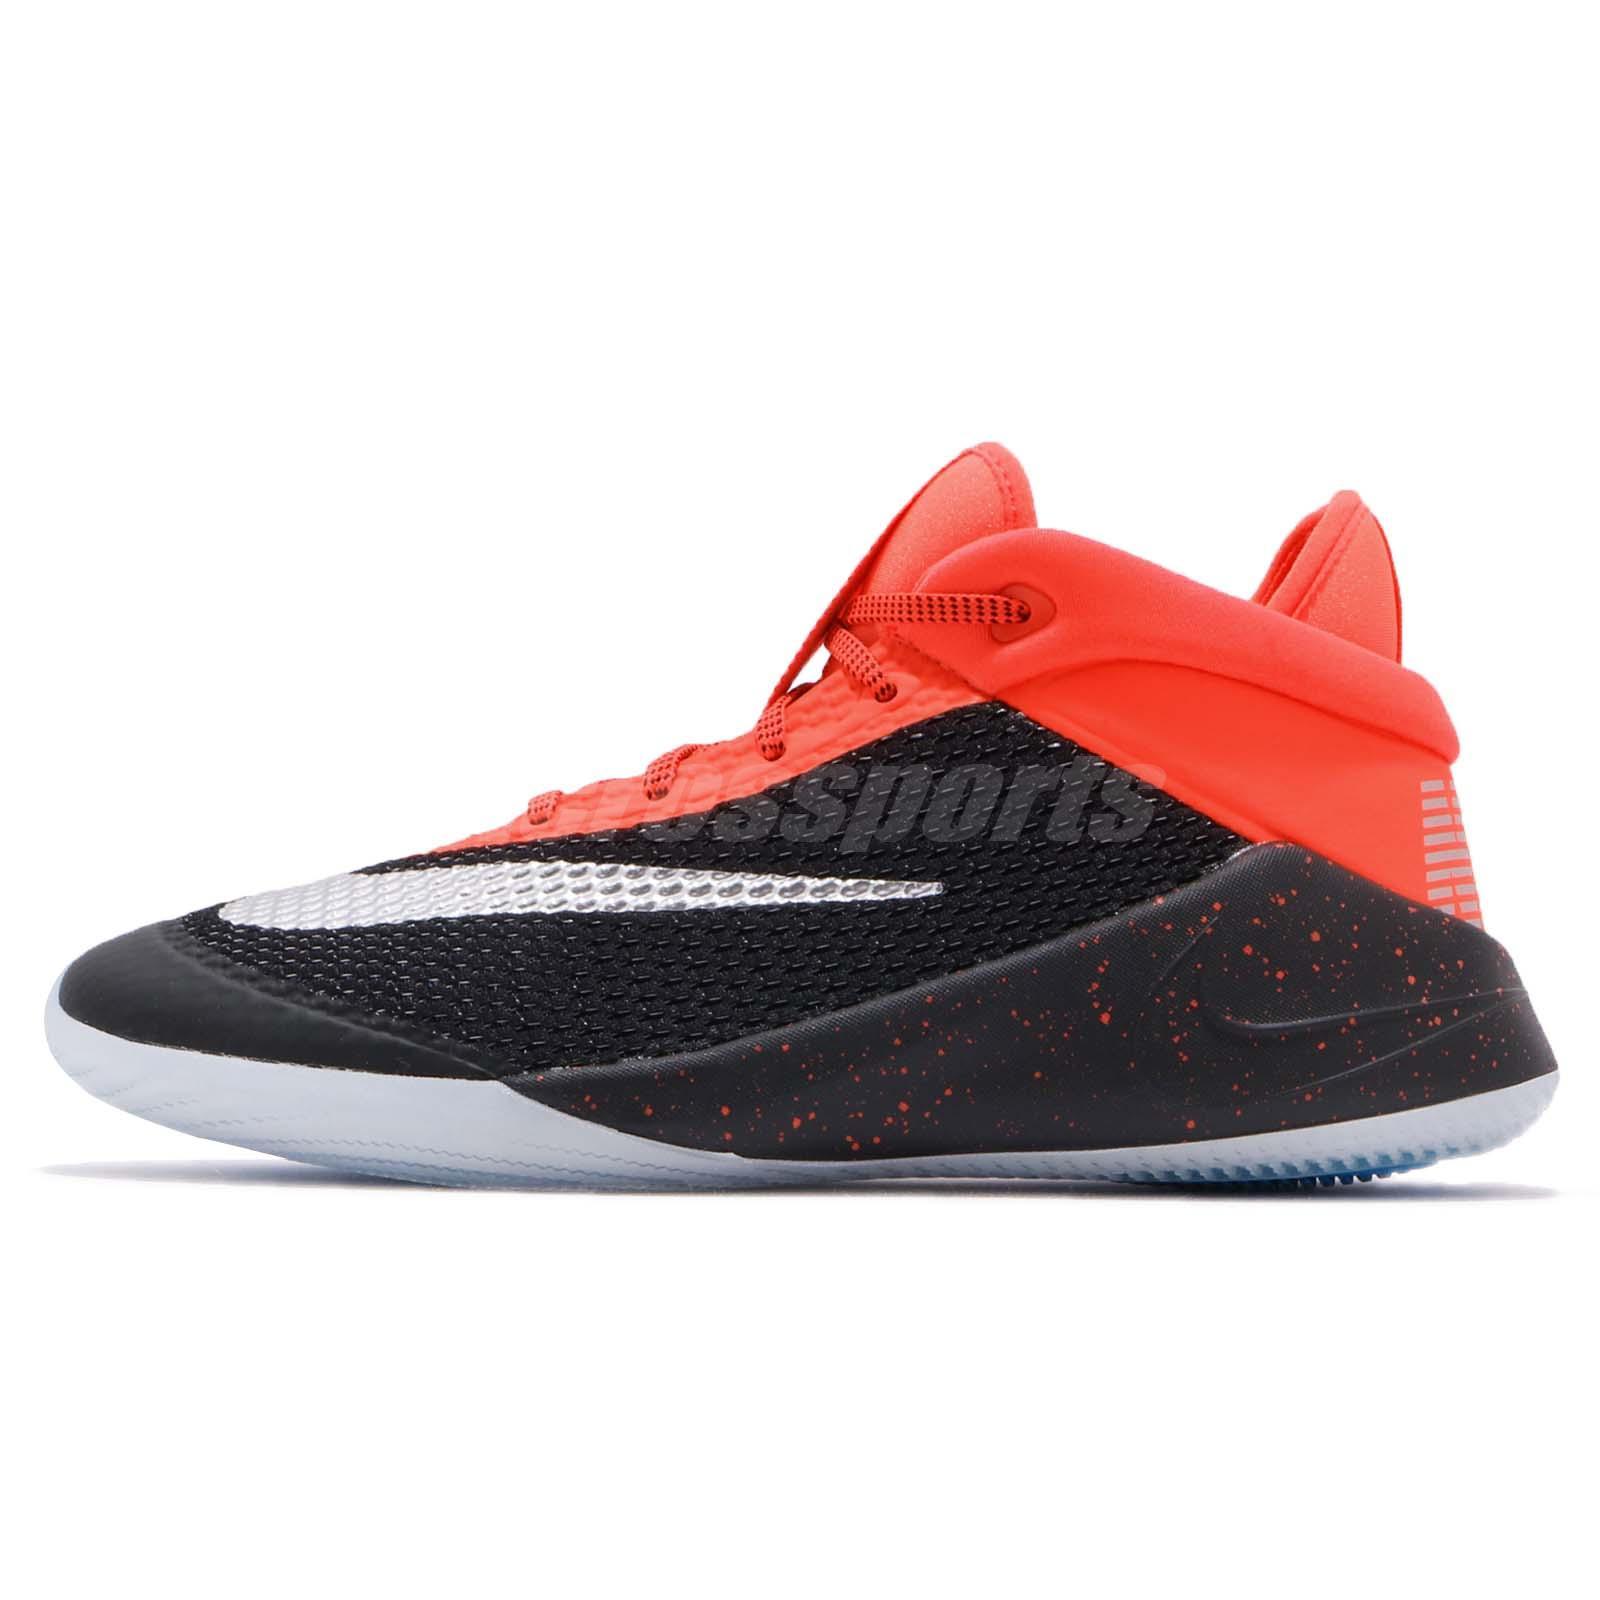 2c7563475034c9 Nike Future Flight GS Black Crimson Kid Youth Women Basketball Shoes AH3430- 001